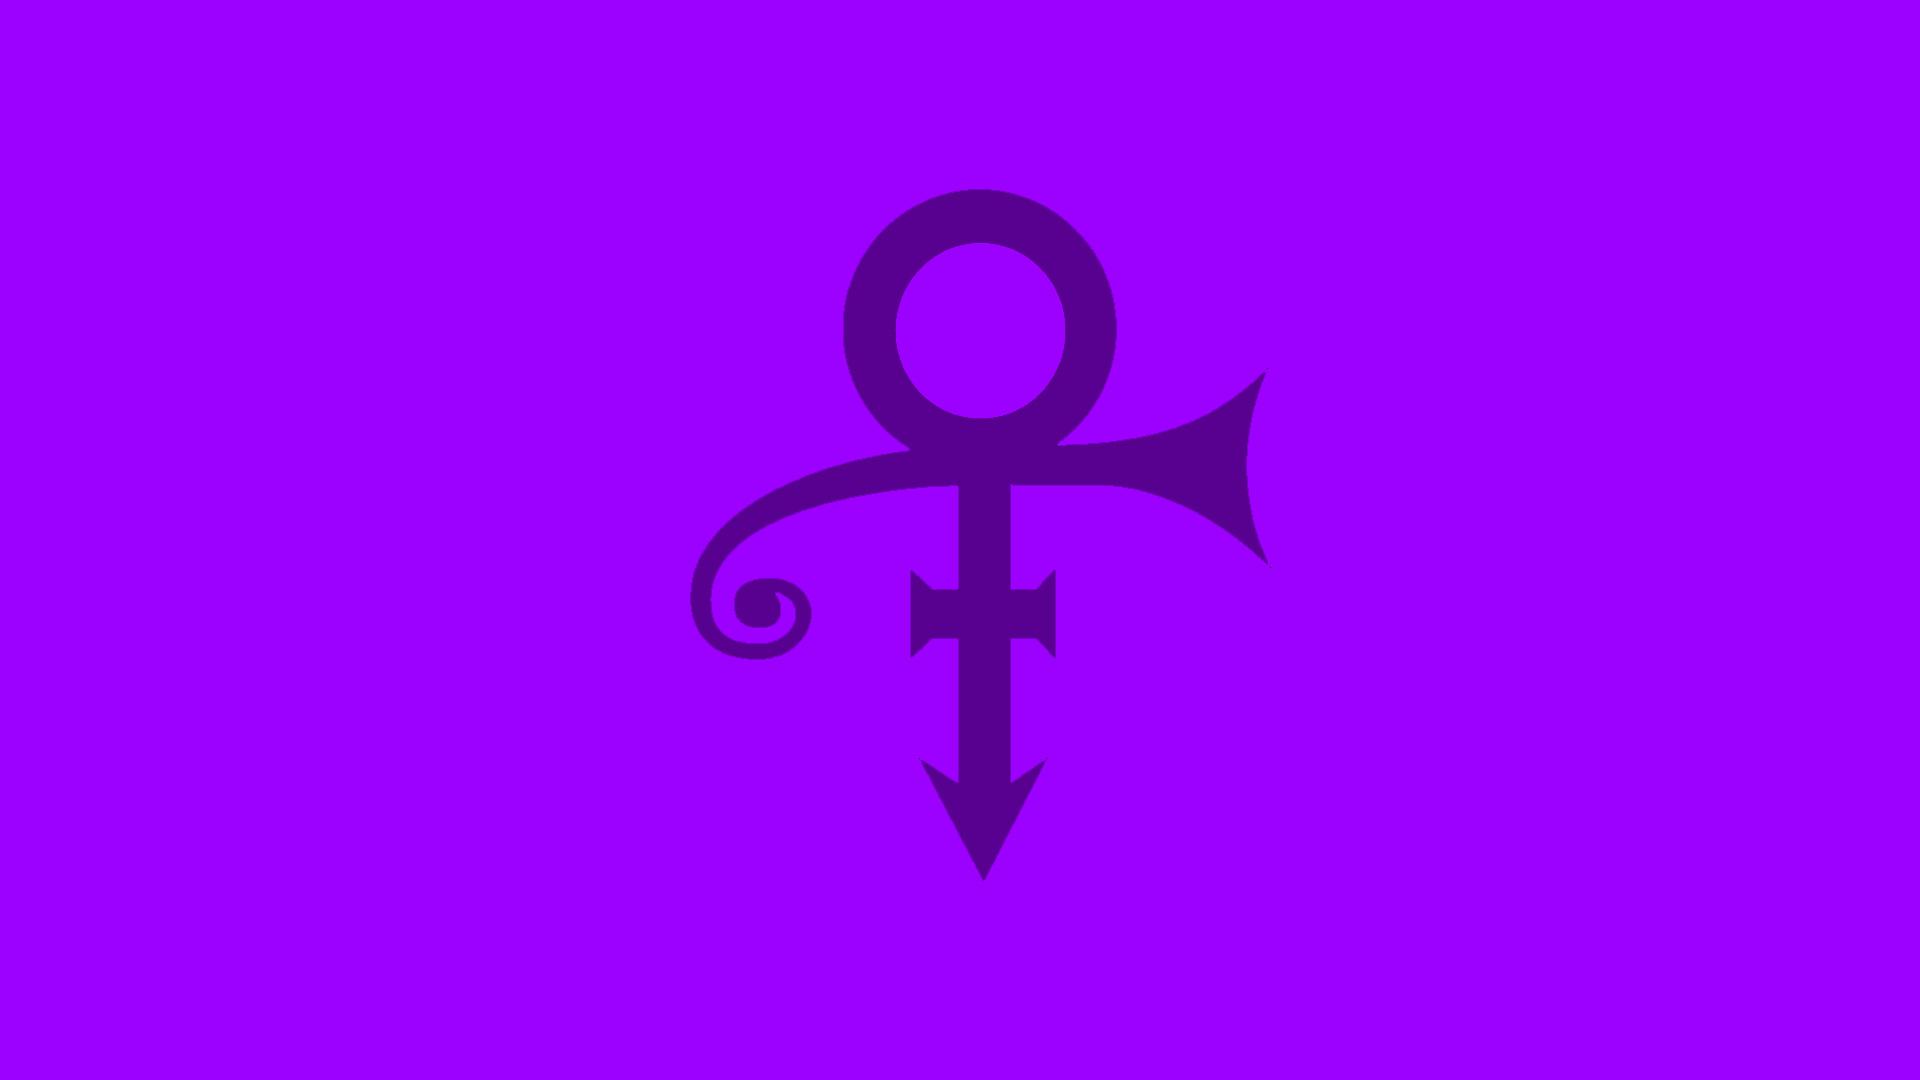 Prince Symbol Kpsu